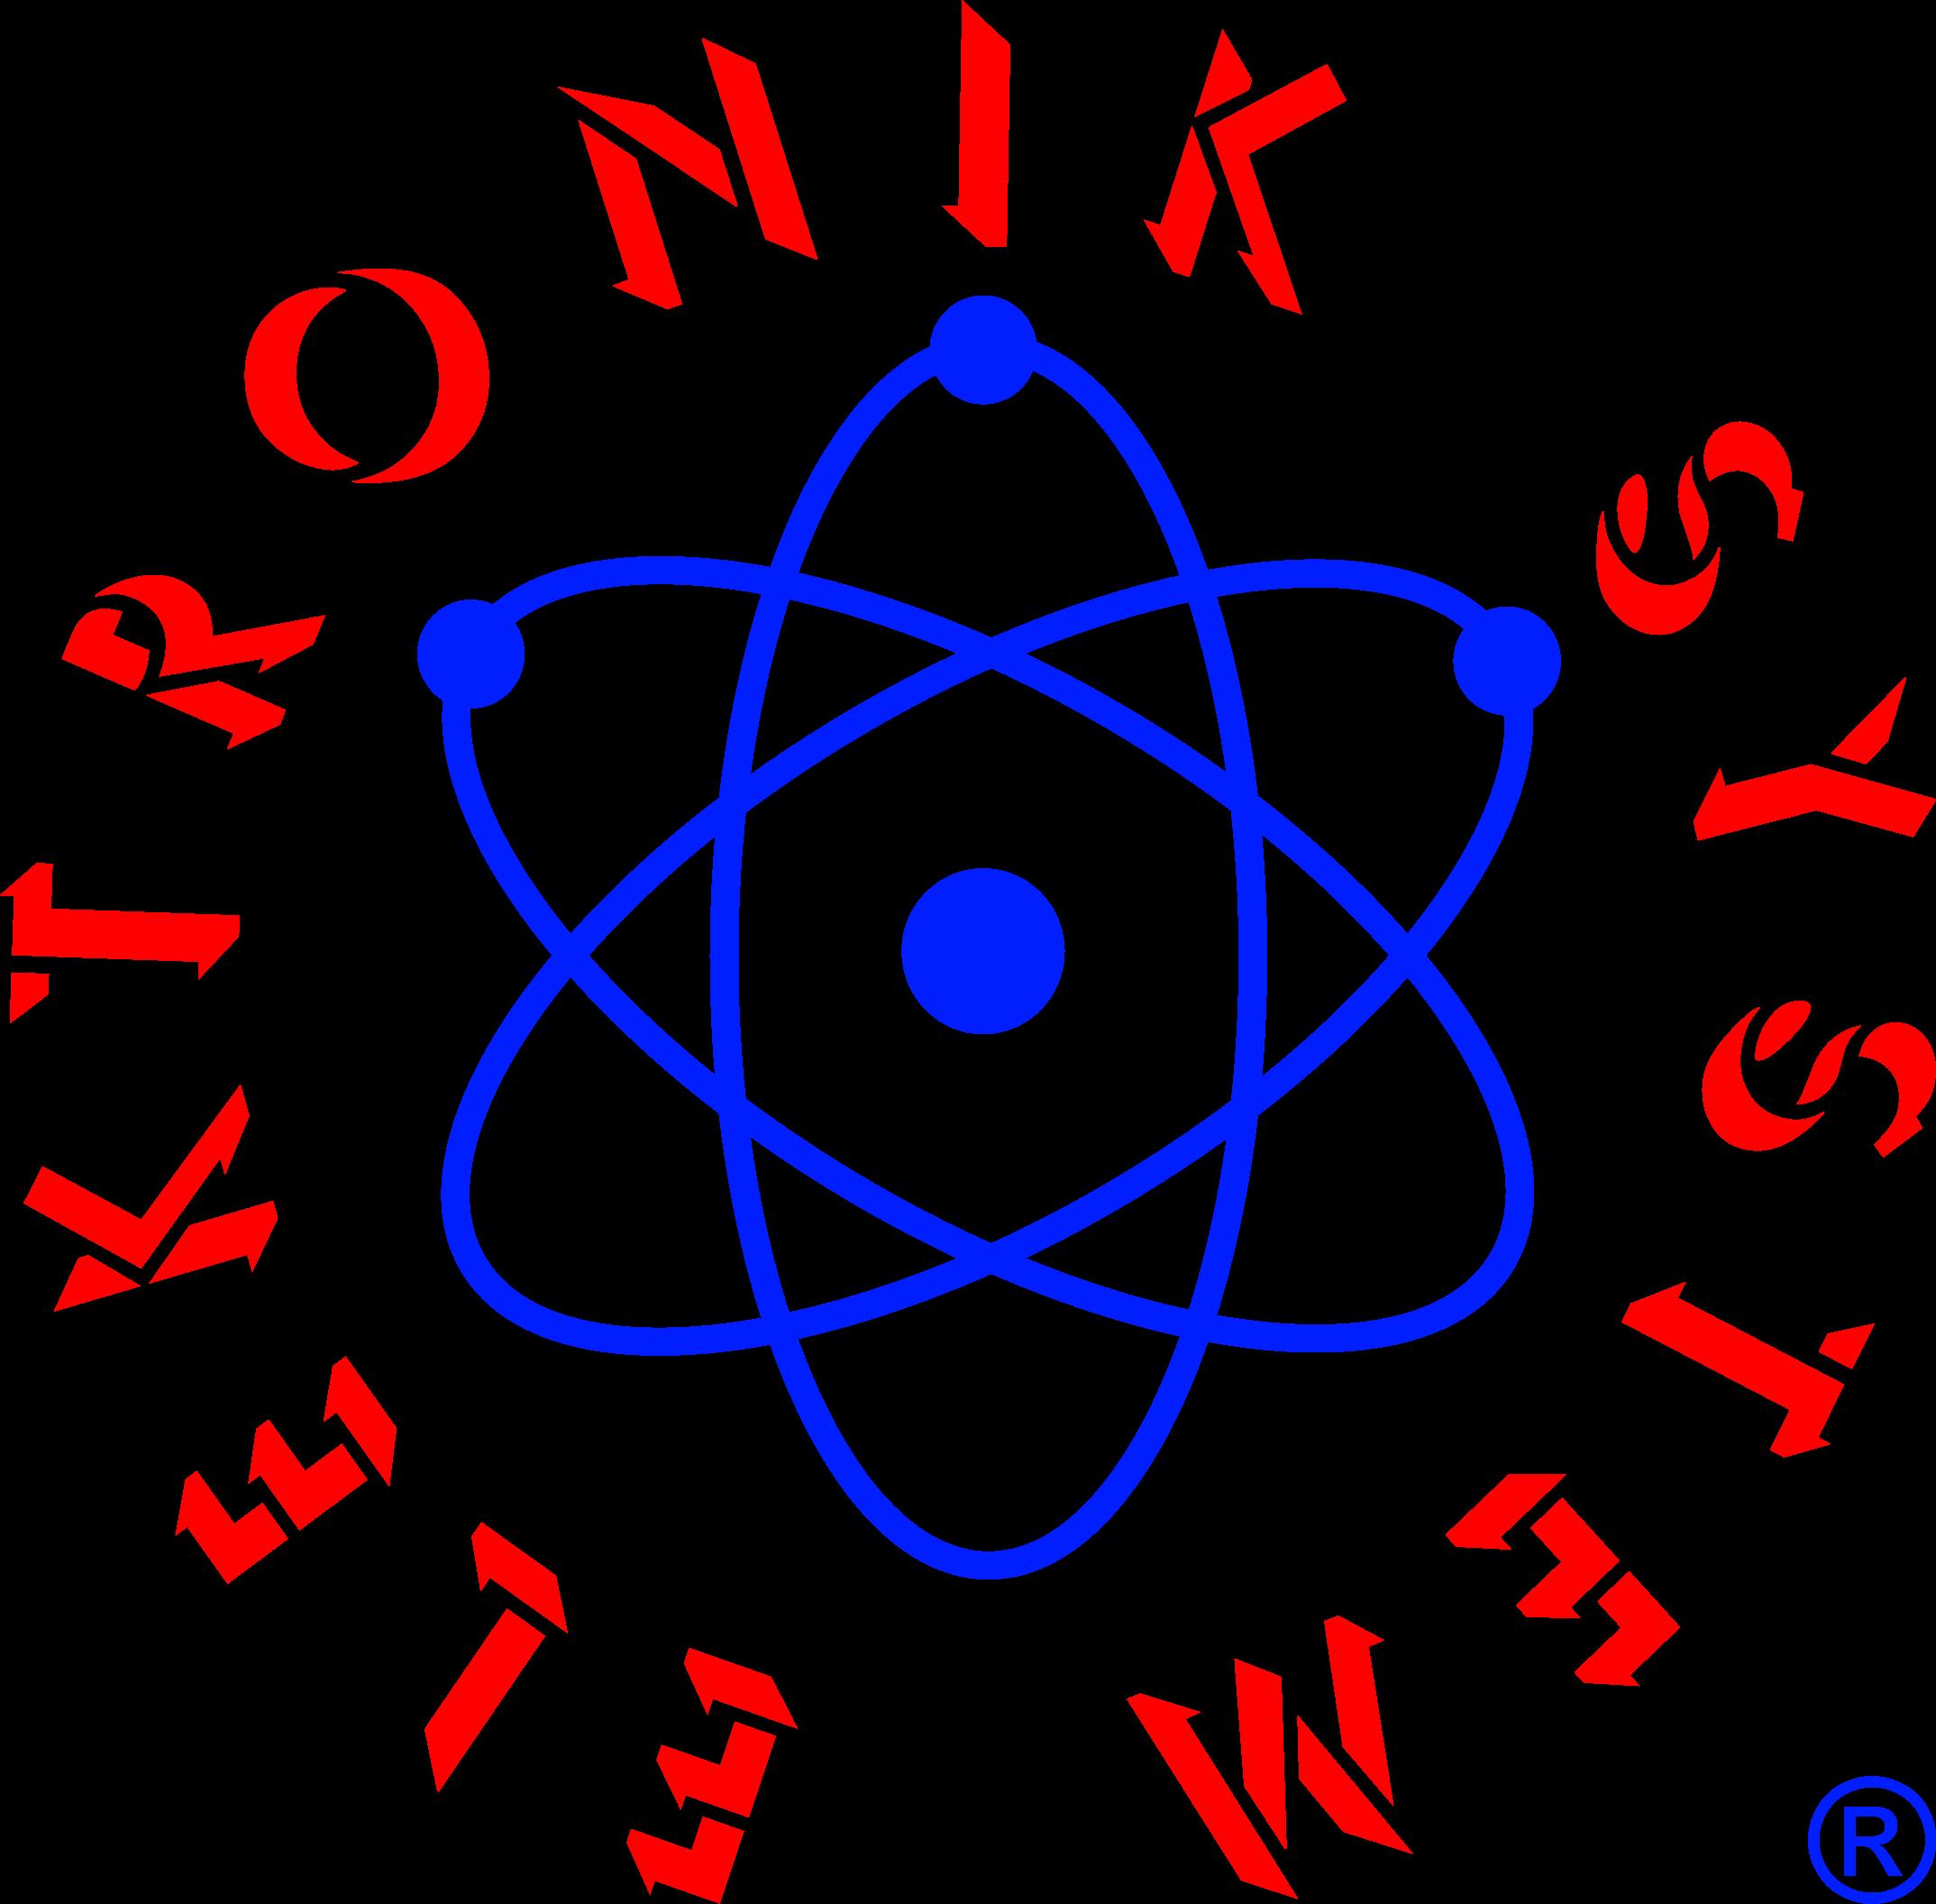 elektronik-system-logo